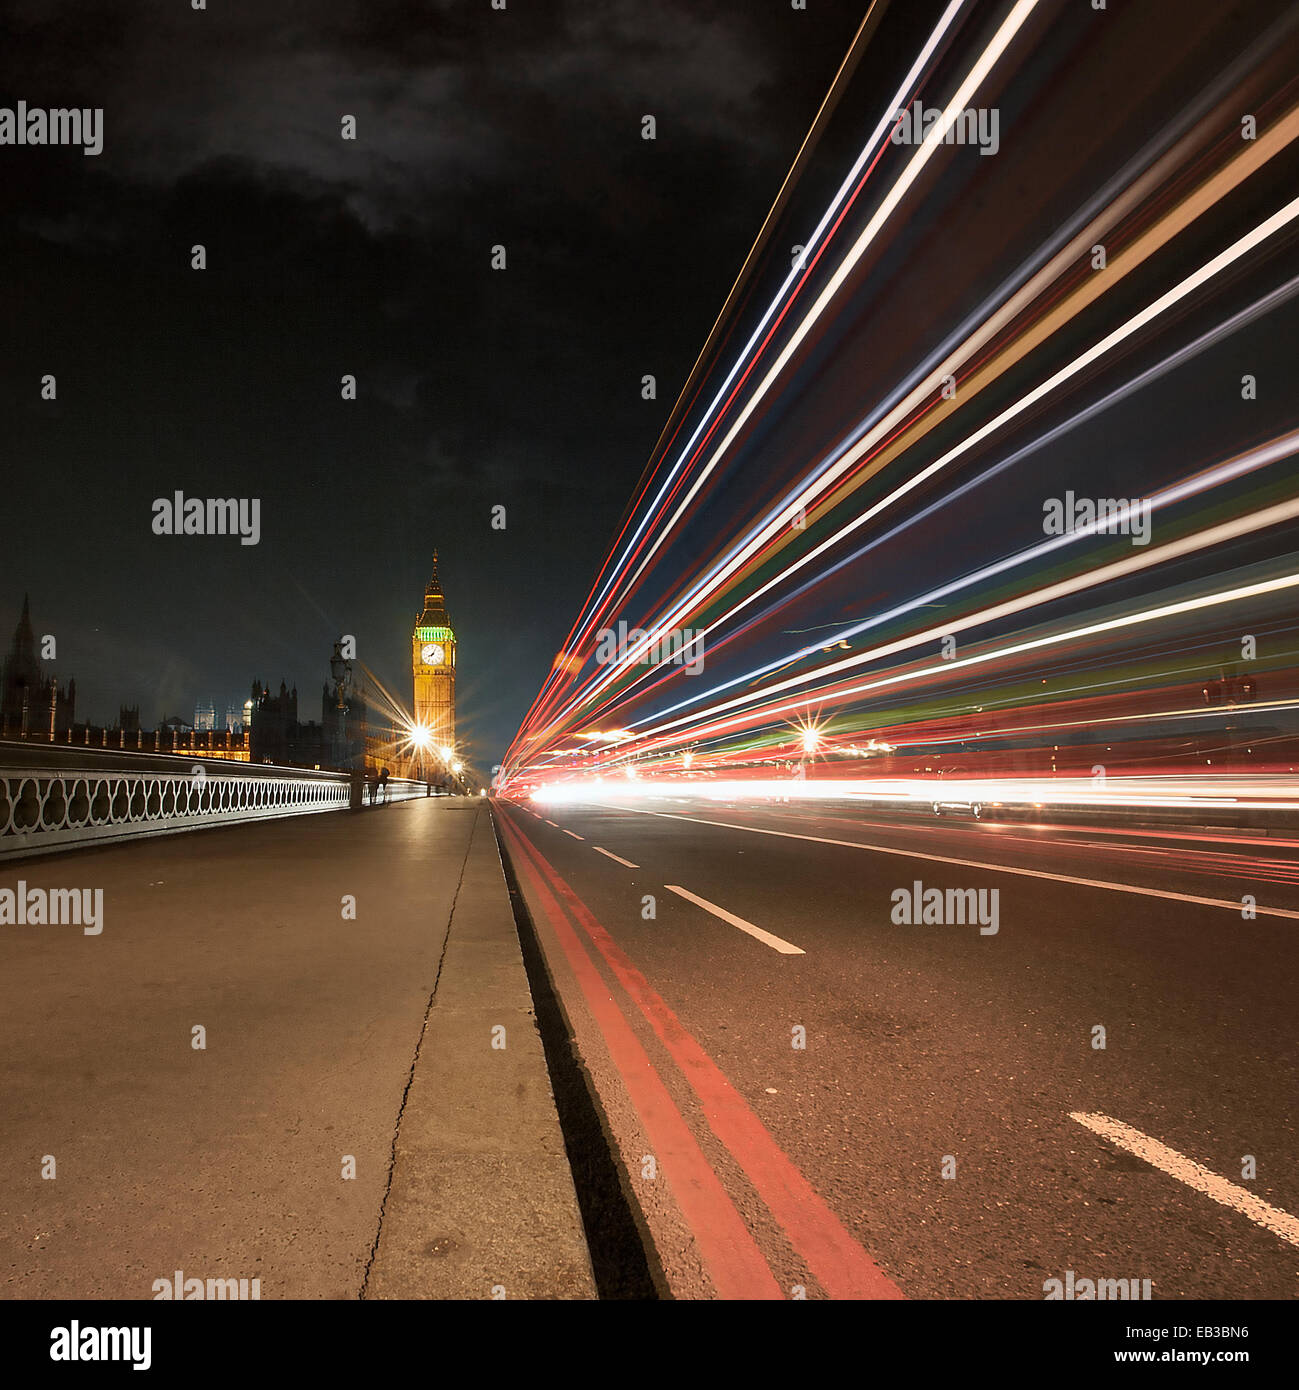 UK, England, London, Light trail on Westminster Bridge - Stock Image